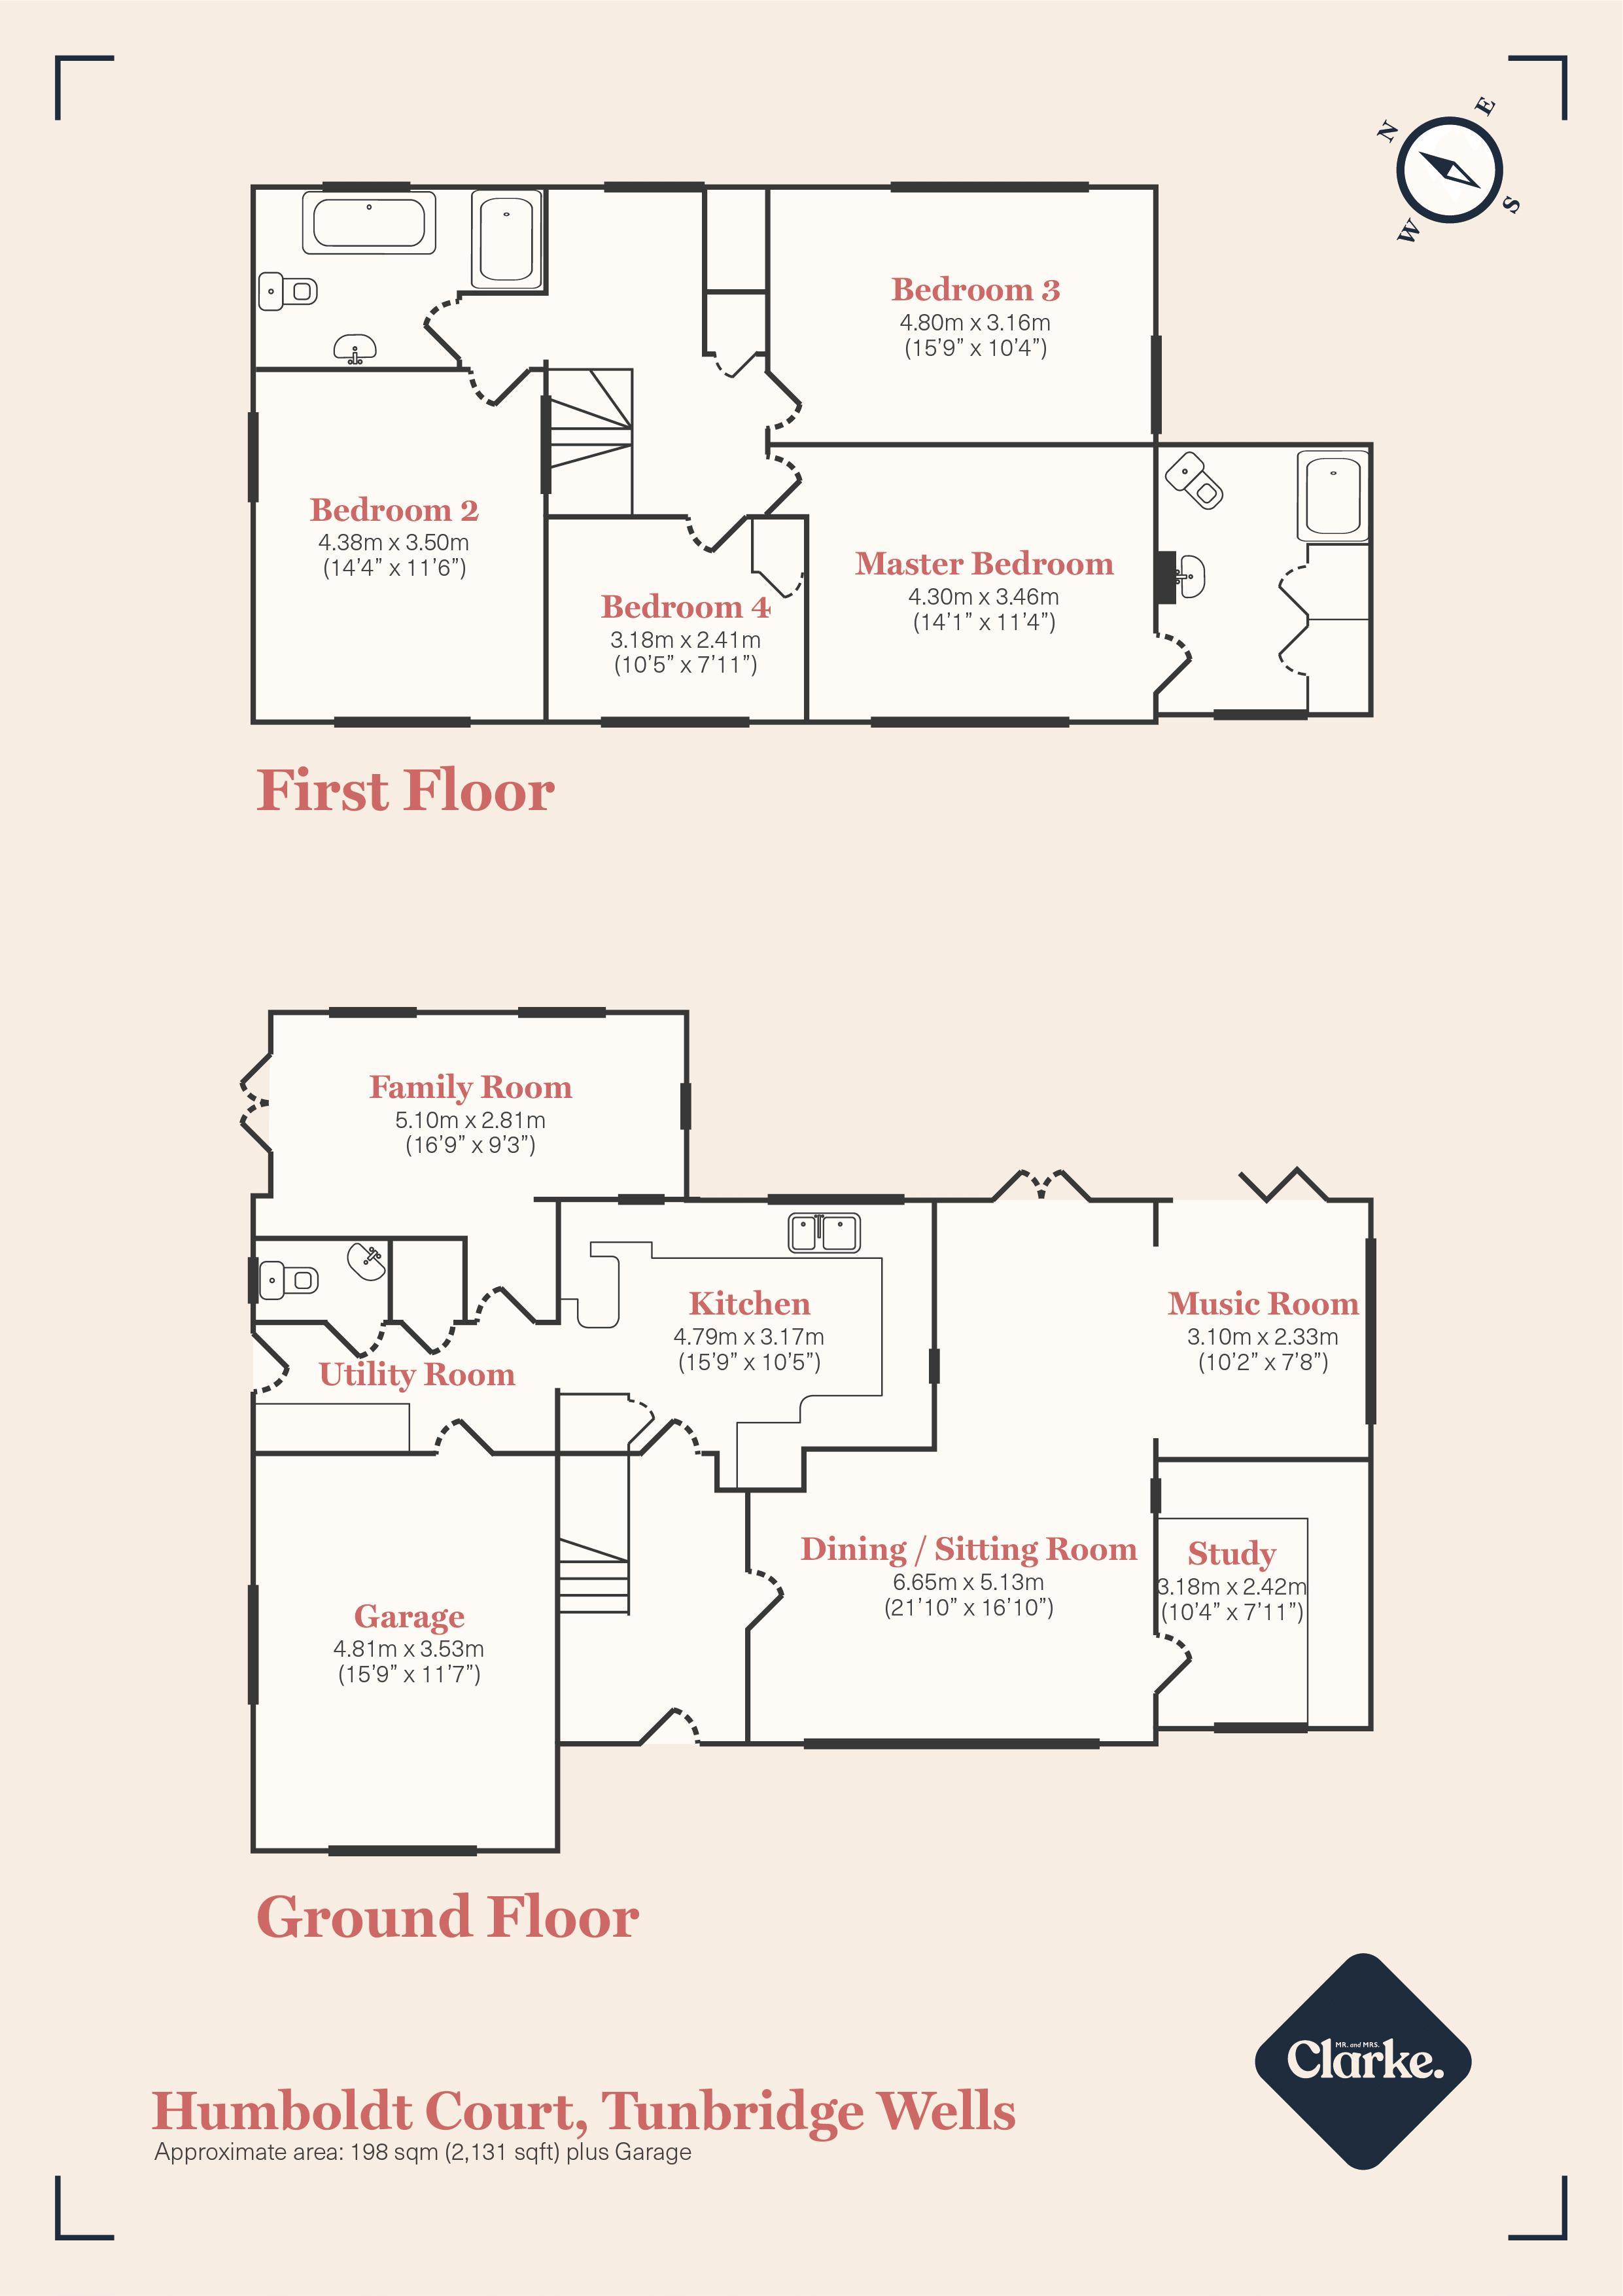 Humboldt Court, Tunbridge Wells. Floorplan.